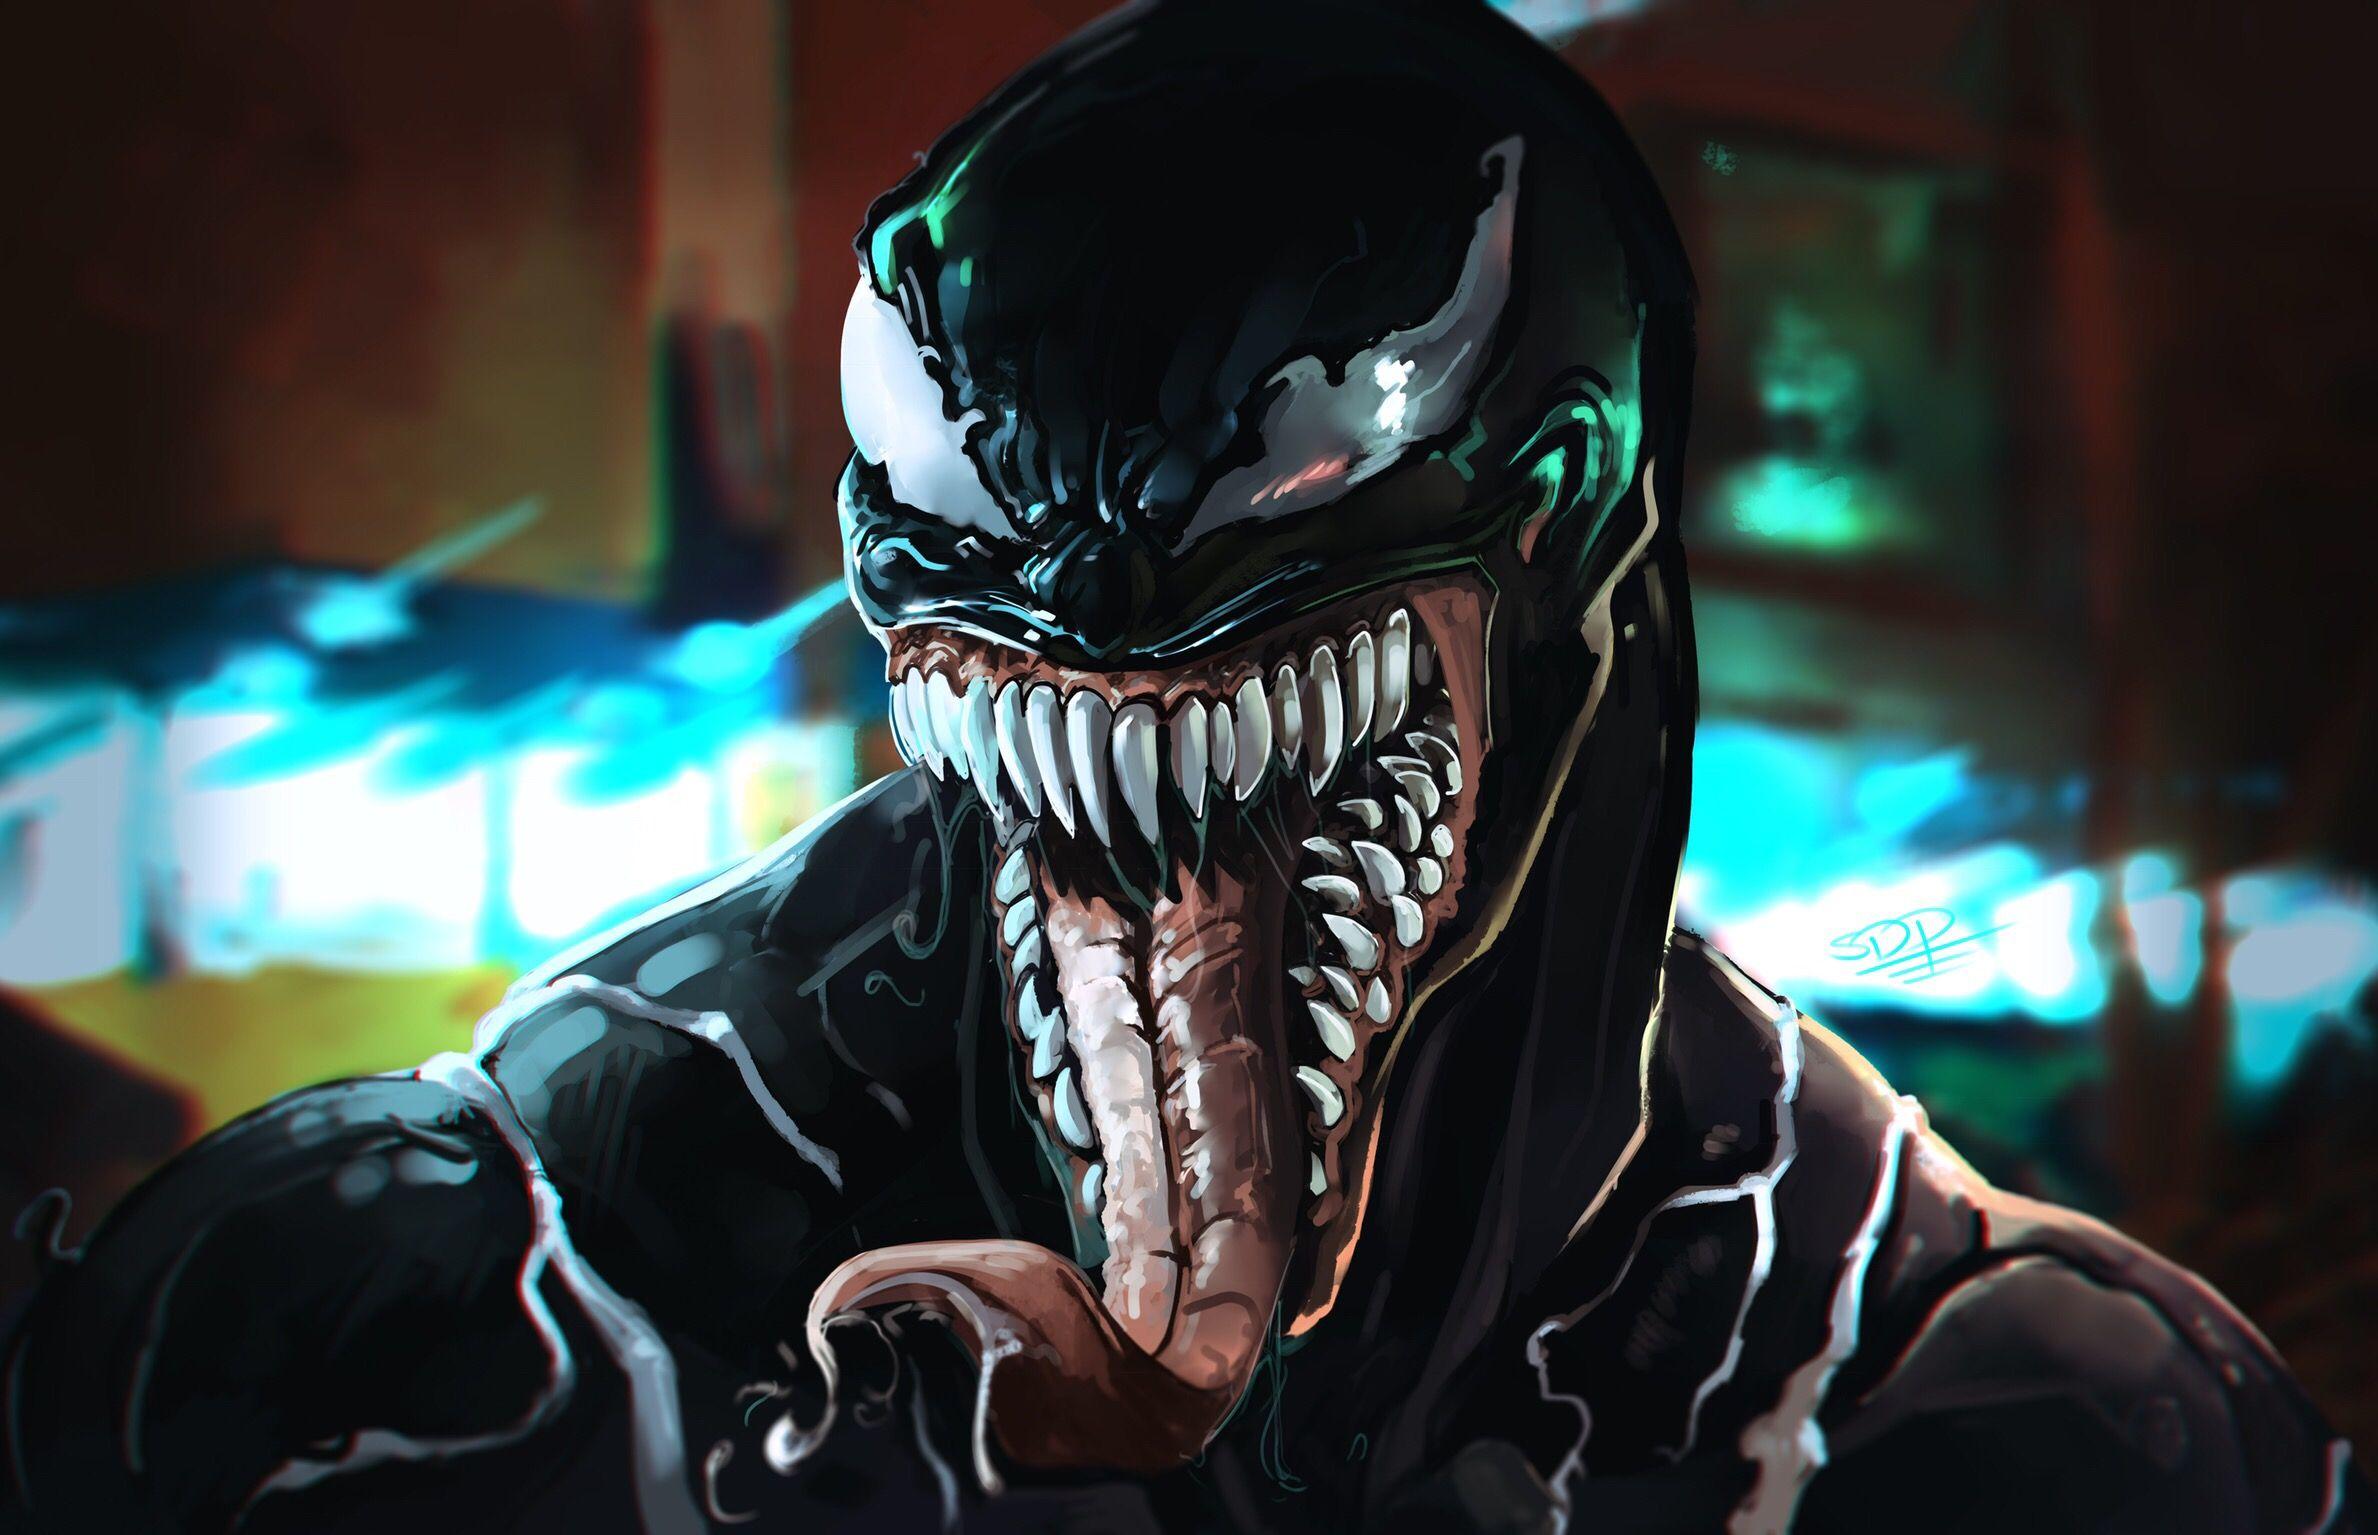 123movies Online Venom Full Watch 2018 Streaming Hd Movie